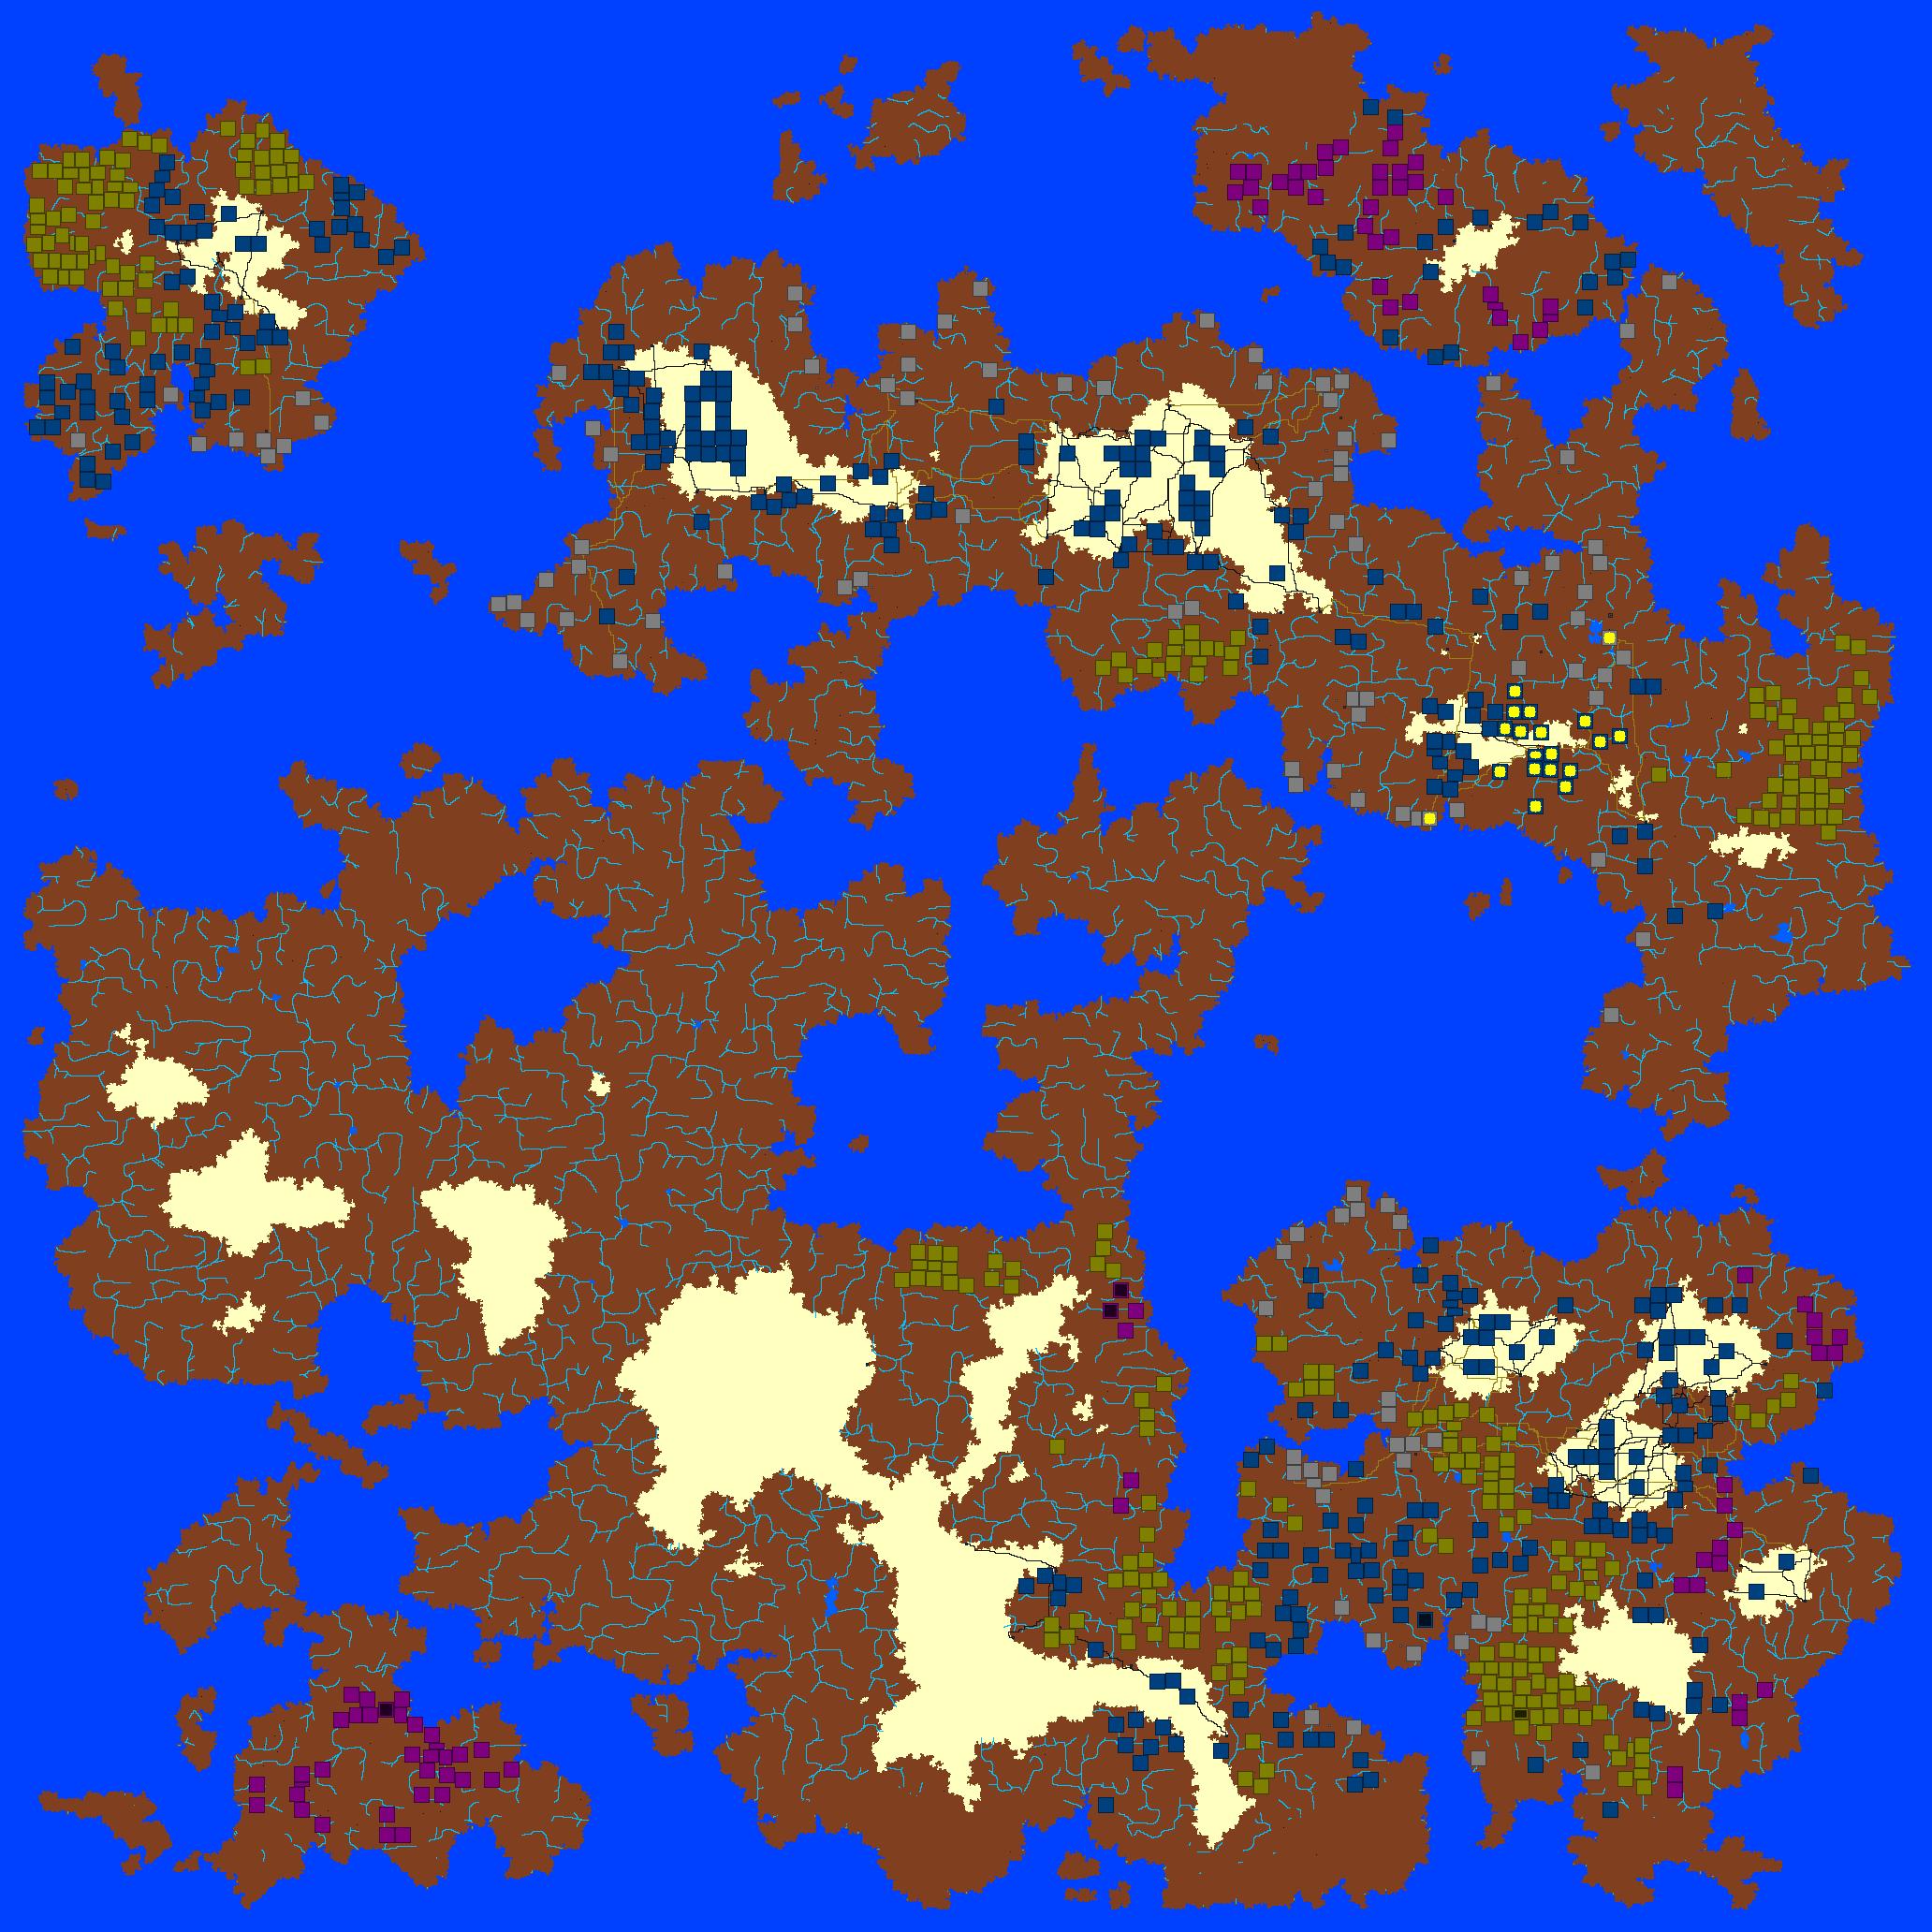 Bay 12 Games: Dwarf Fortress